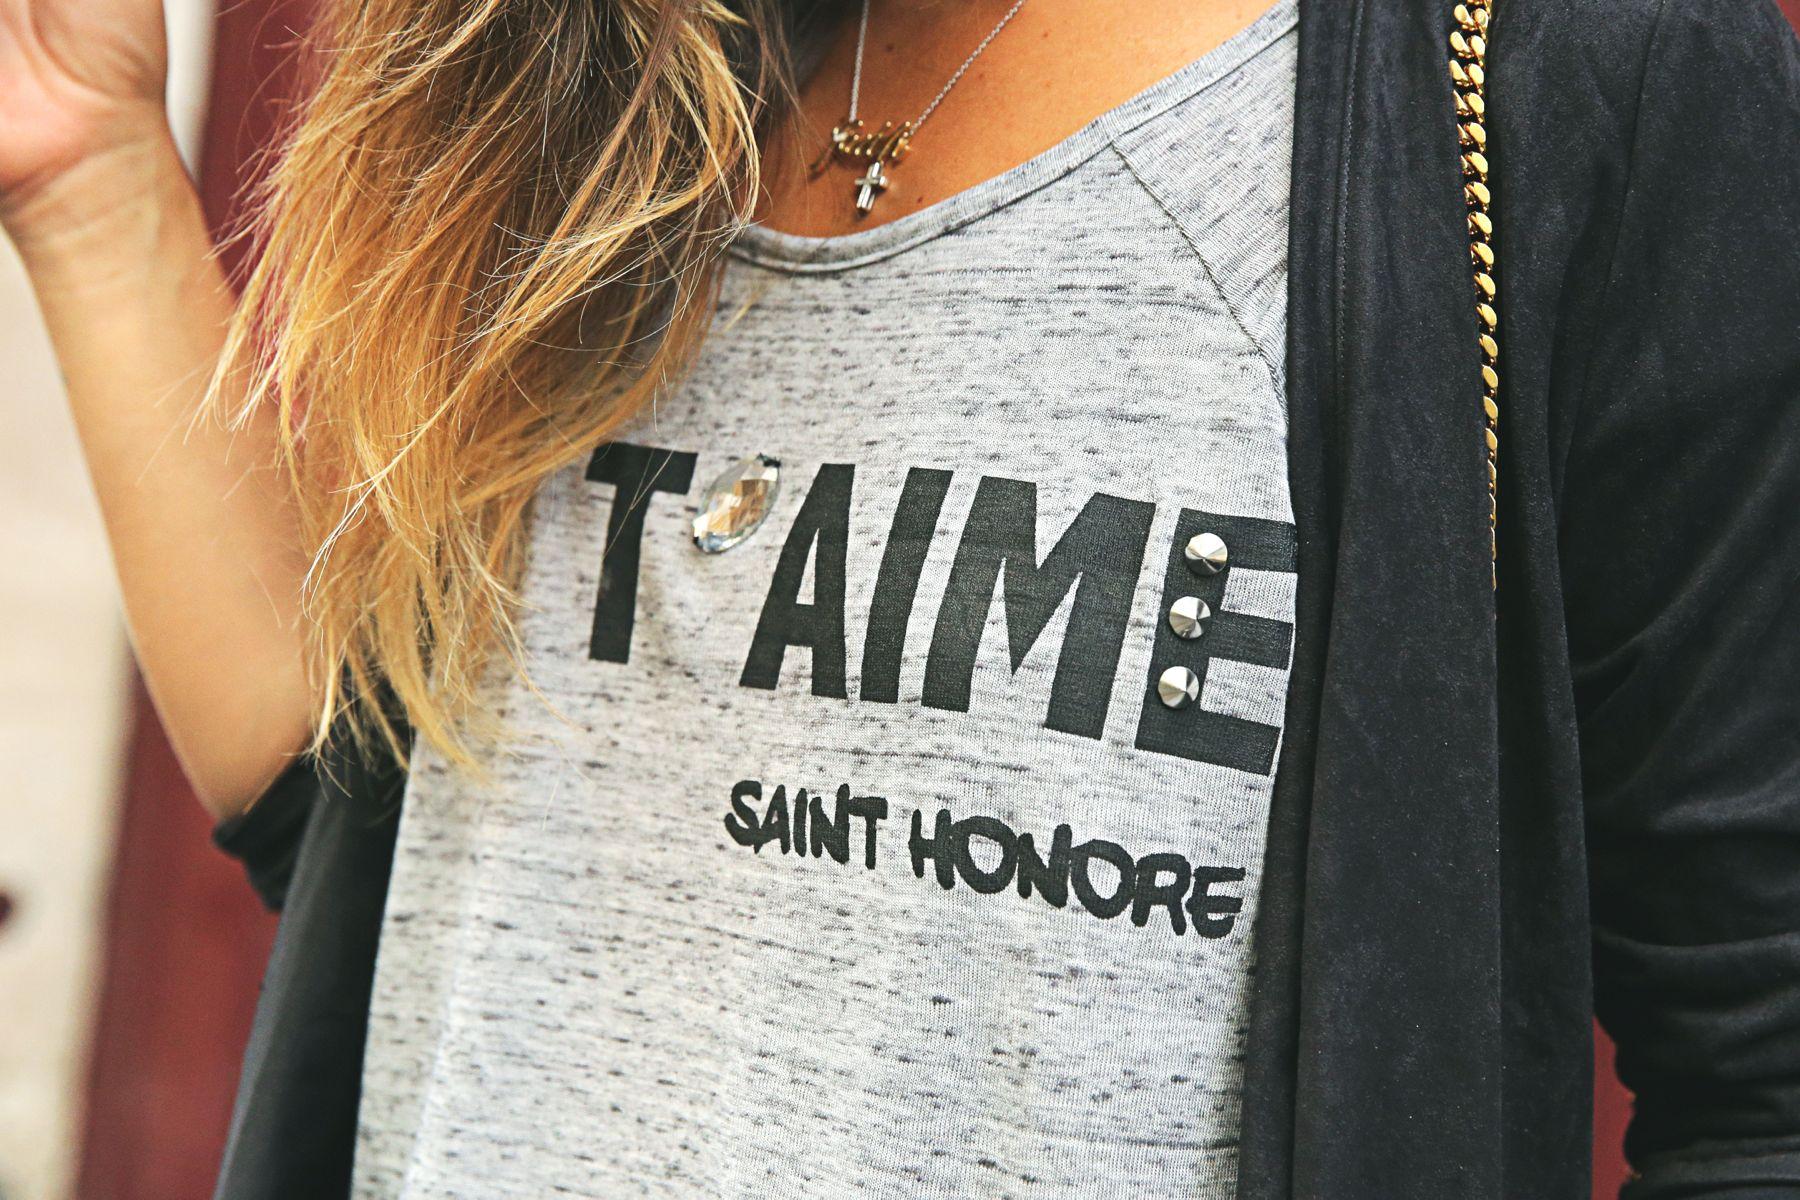 trendy-taste-look-outfit-street-style-ootd-blog-blogger-fashion-spain-moda-españa-fringed-jacket-mustt-ysl-falda-mekdes-leather-piel-3